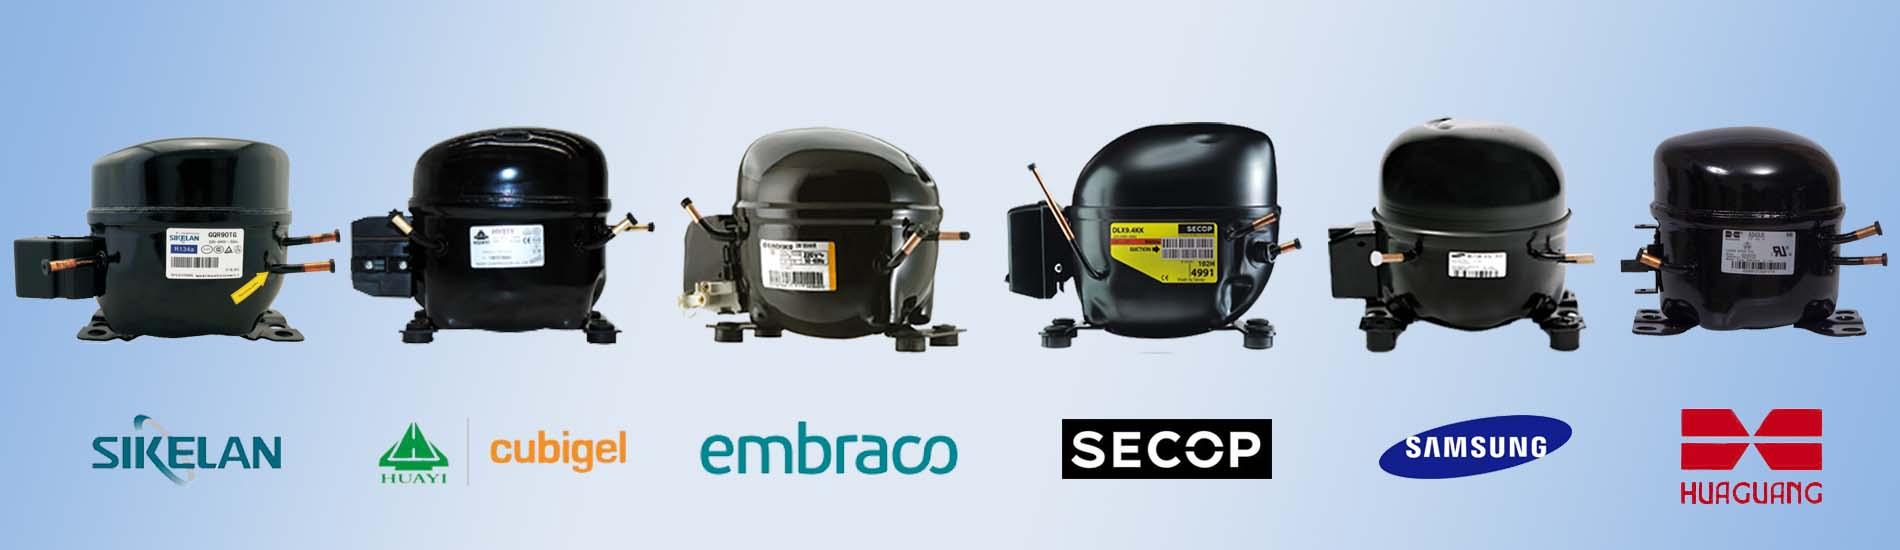 SECOP-Huaguang-KONOR-SIKELAN-Embraco-Samsung-wanbao-HUAYI-Cubigel-Refrigerator-Compressor